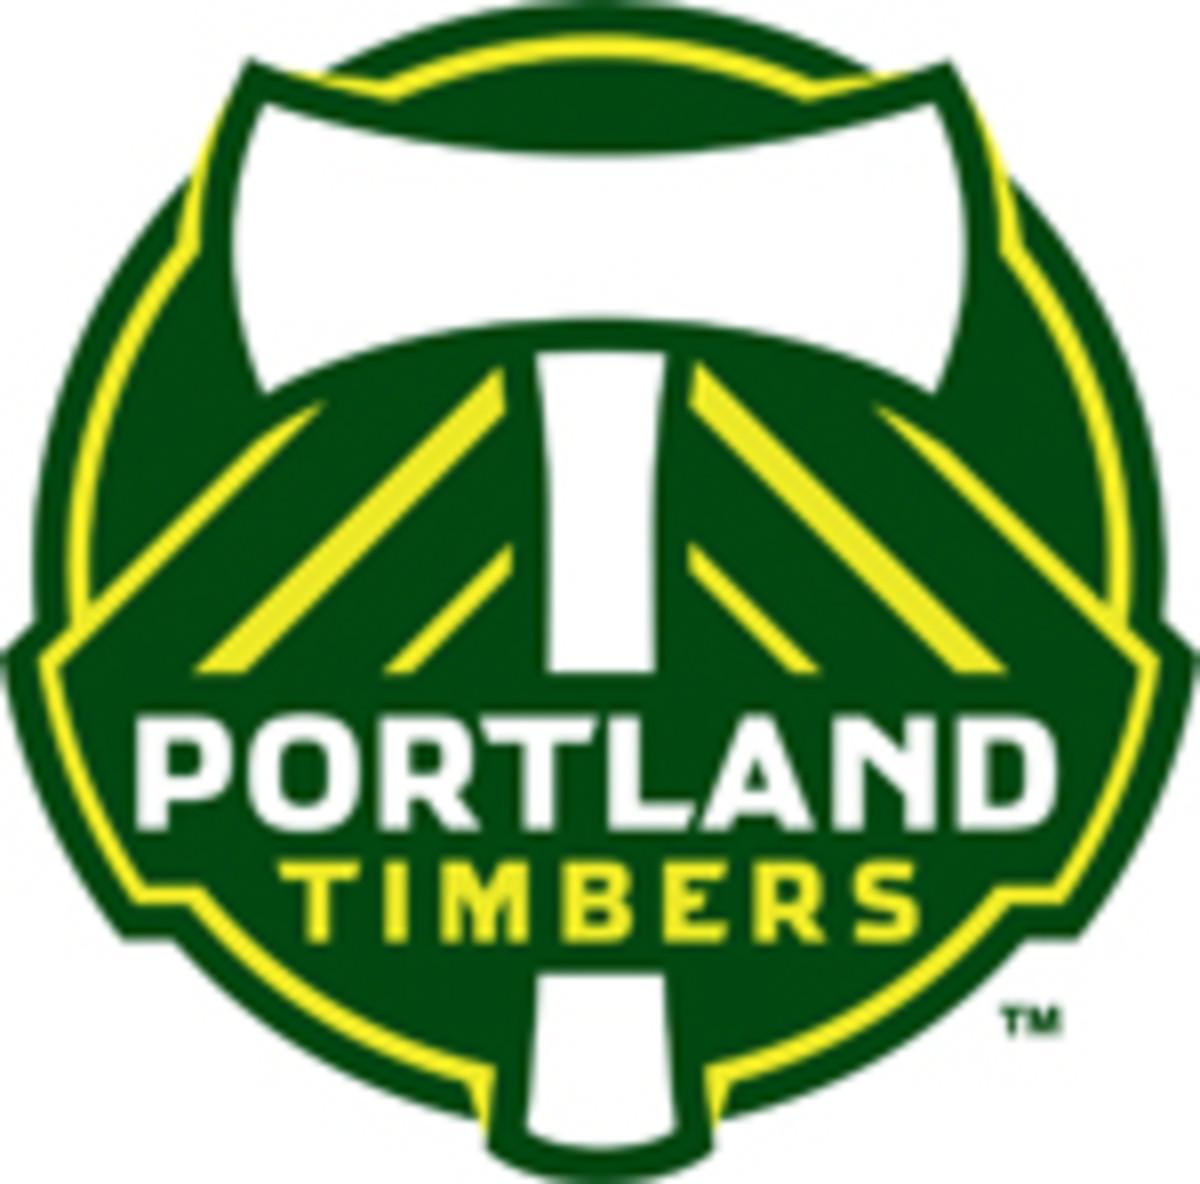 portland-timbers-logo